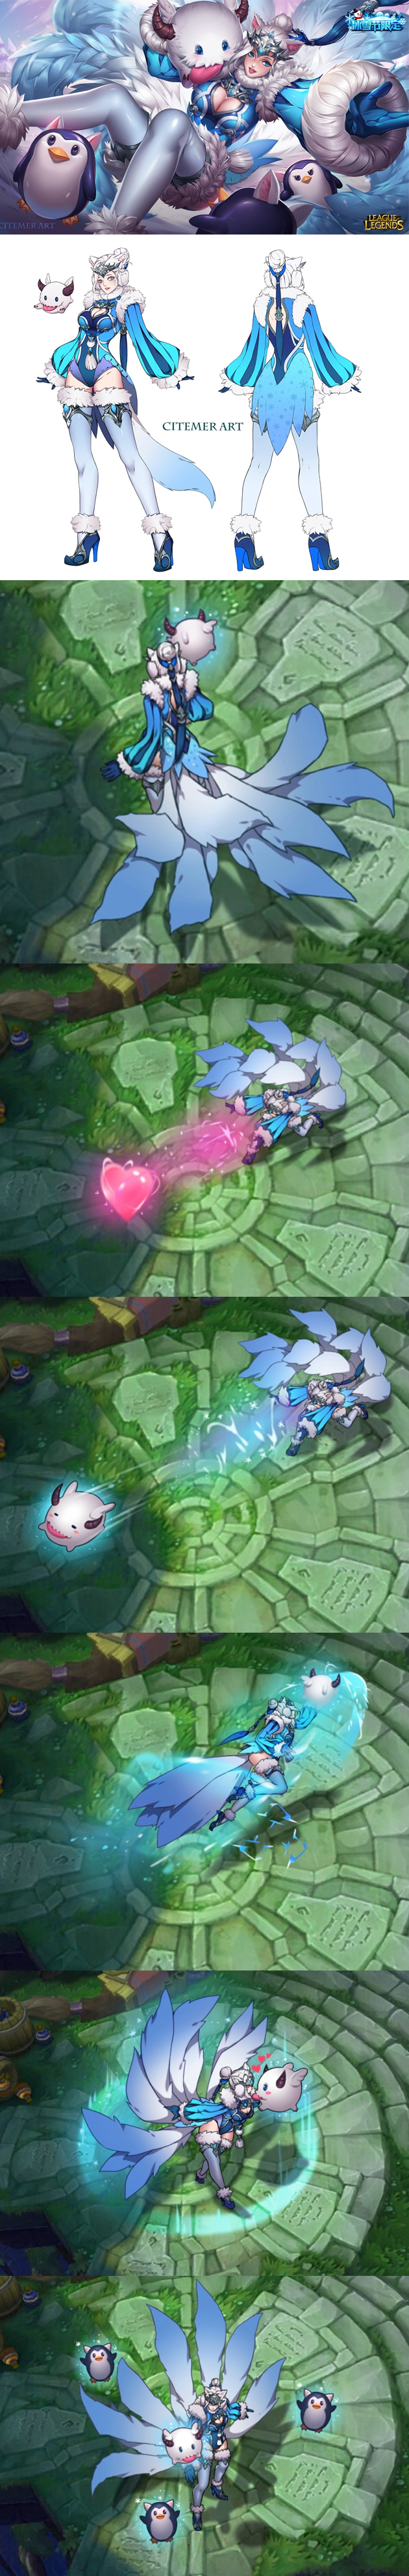 Snowdown Ahri - League of Legends